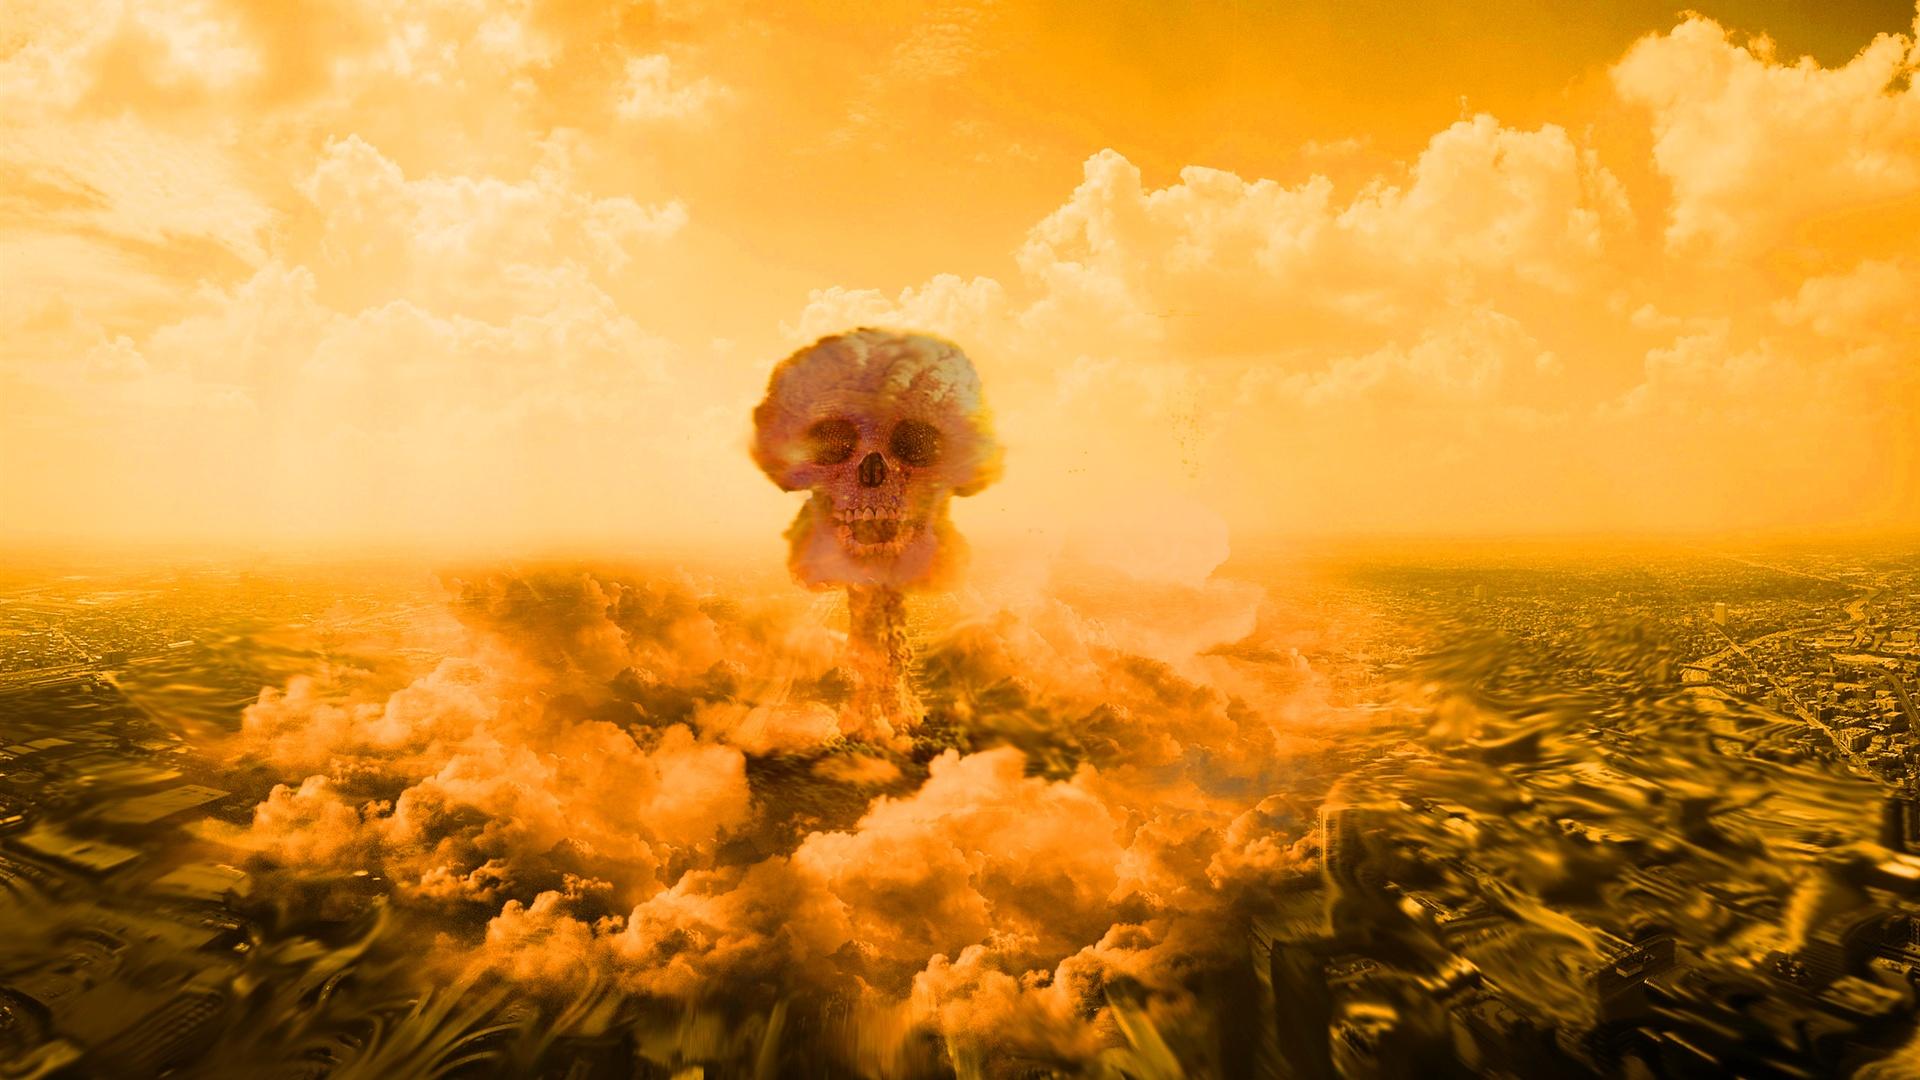 [Image: Nuclear-explosion-mushroom-cloud_1920x1080.jpg]